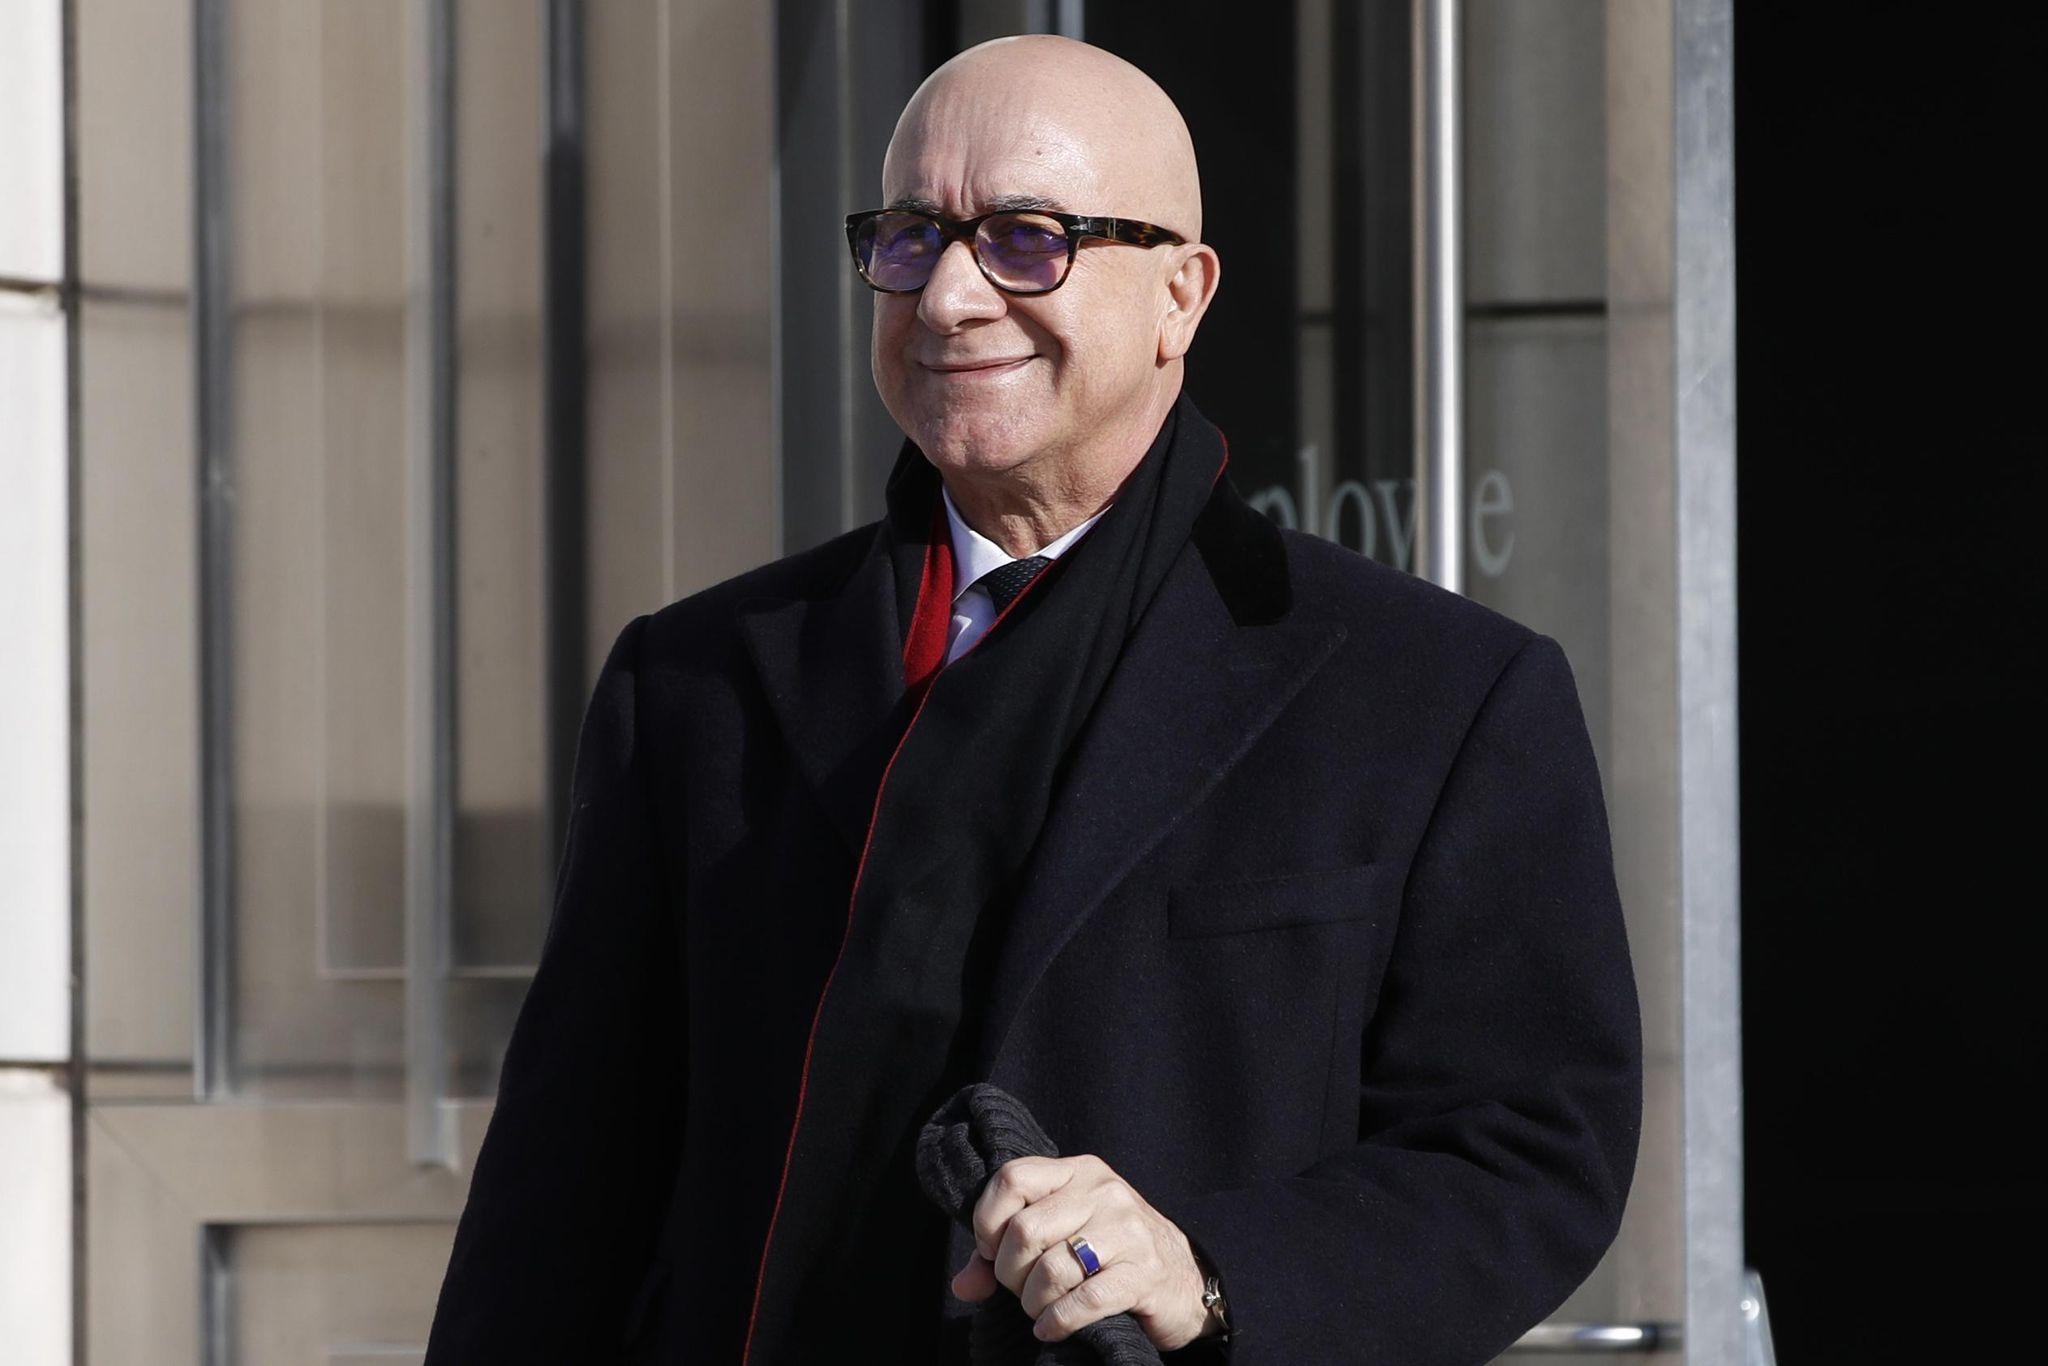 Bijan Kian, Michael Flynn business partner, convicted on two counts